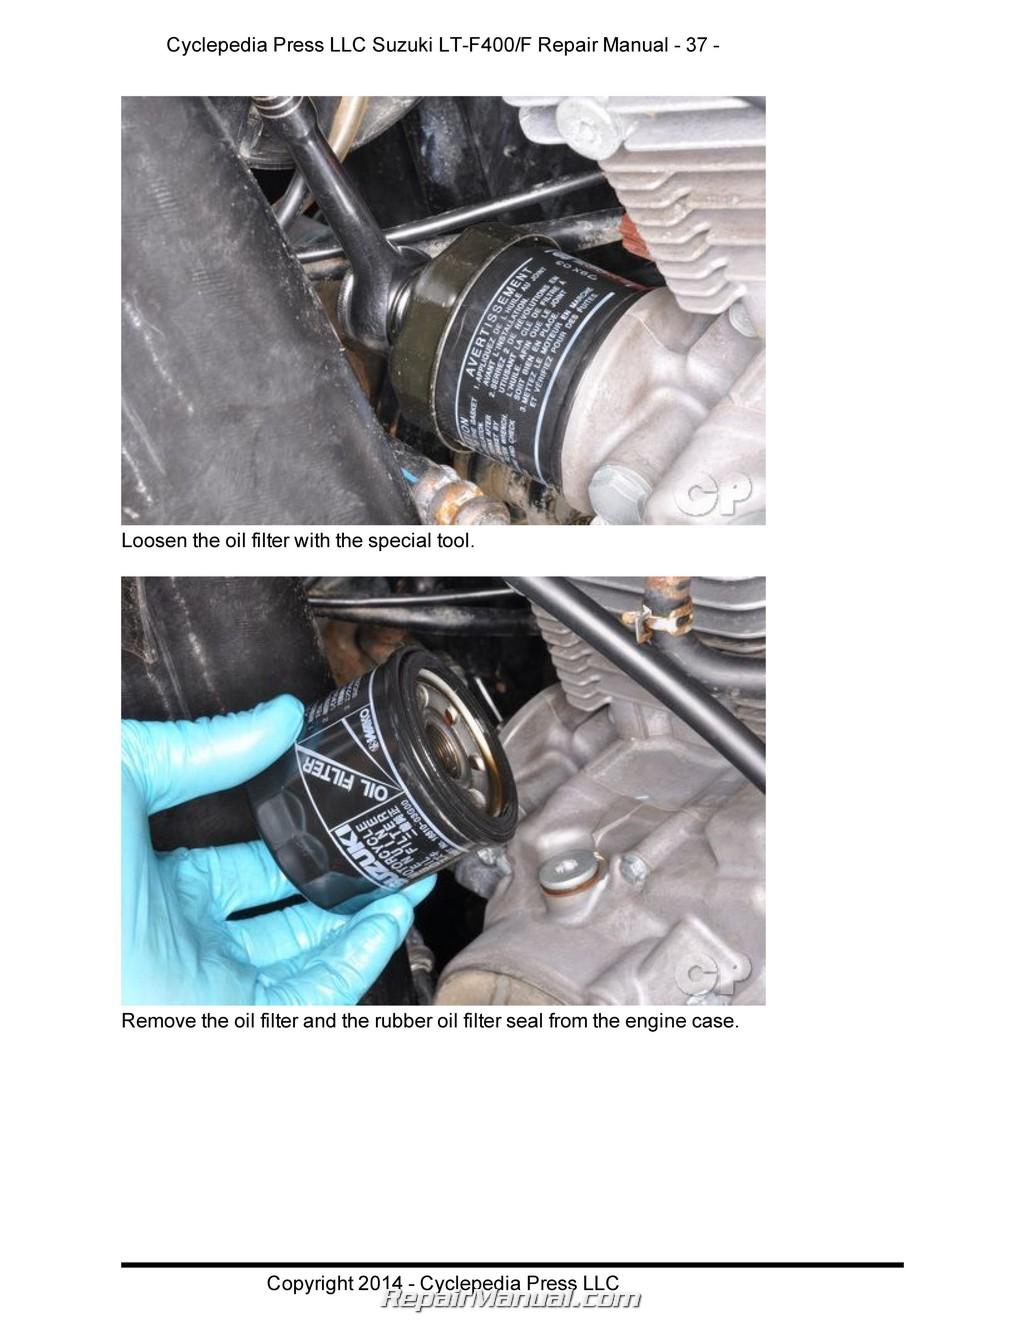 suzuki eiger quadrunner 400 parts motorcycle image idea. Black Bedroom Furniture Sets. Home Design Ideas